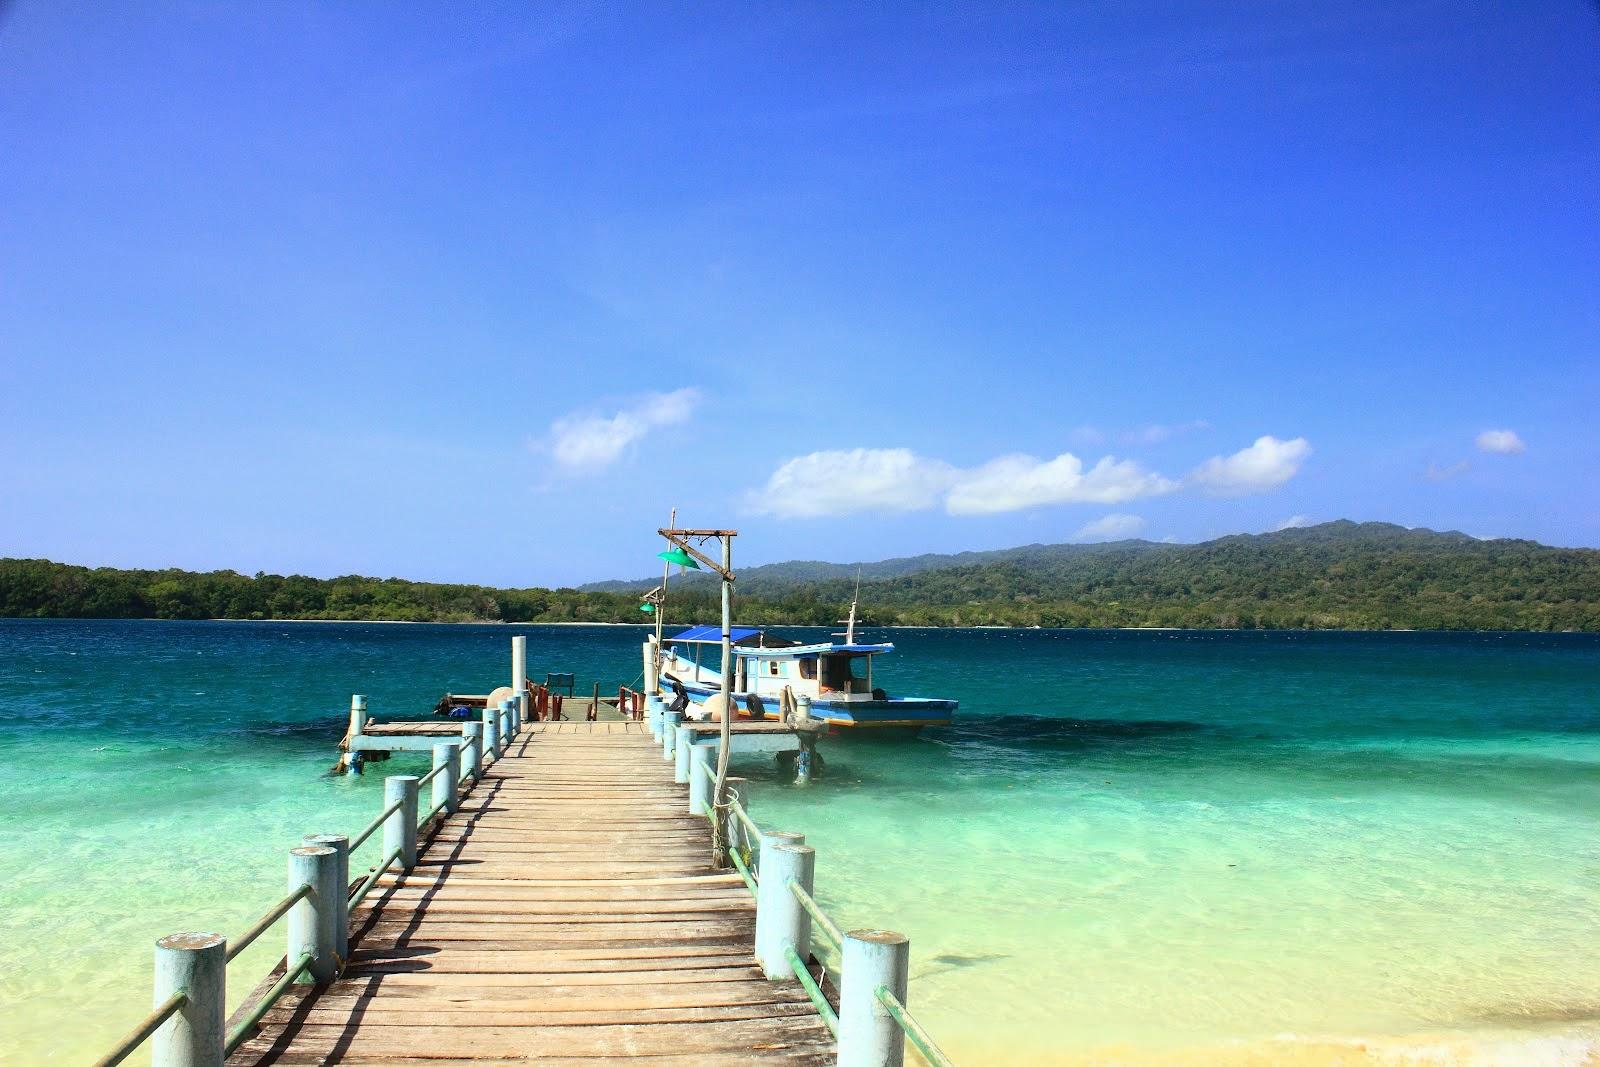 Cantiknya Pantai Pulau Peucang Ujung Kulon Tempat Wisata Panaitan Kab